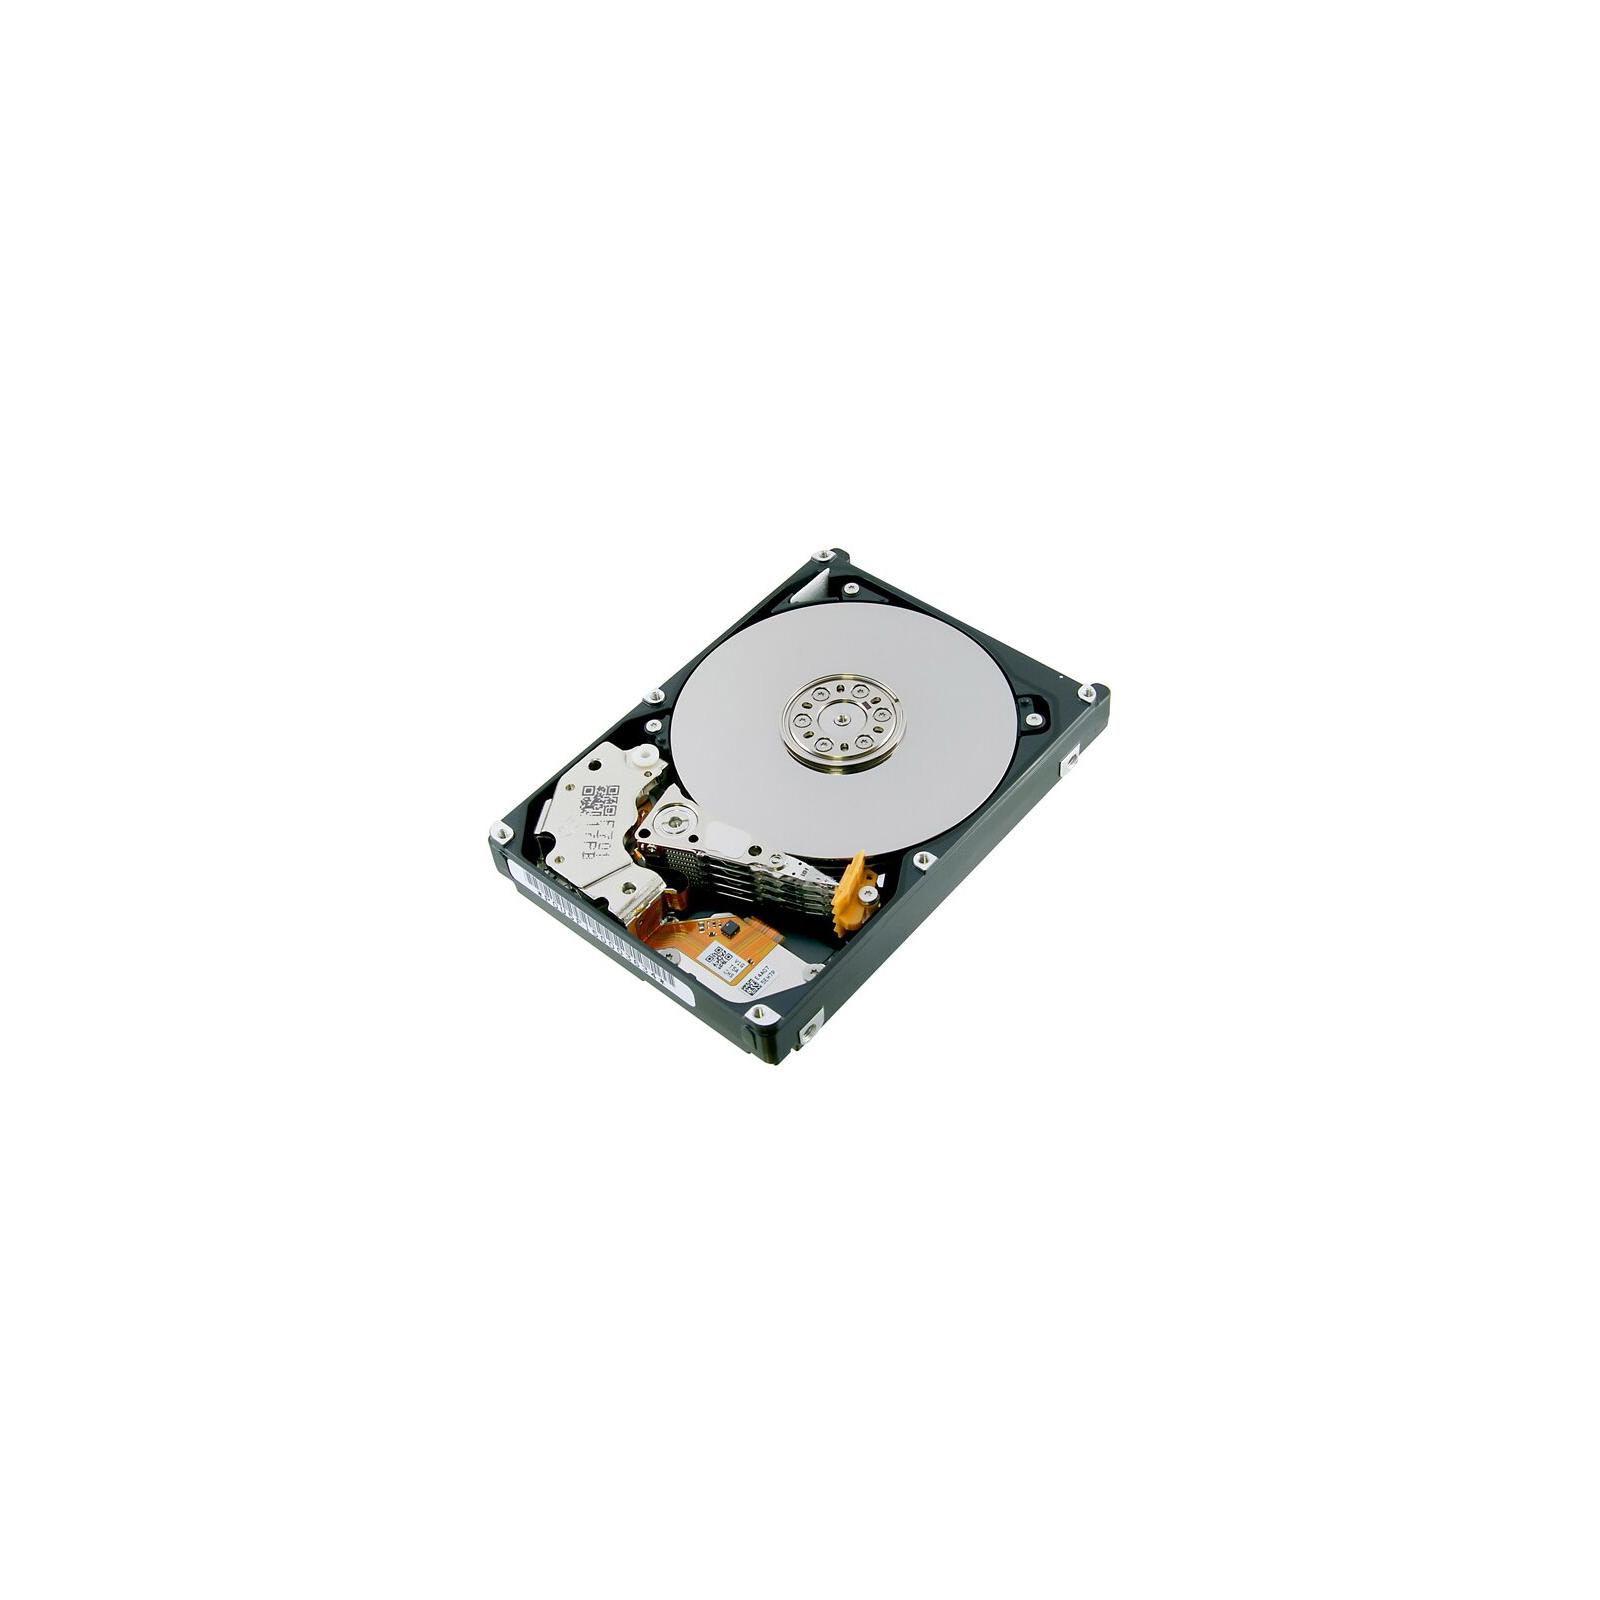 "Жесткий диск для сервера 2.5"" 1.2TB Toshiba (AL14SEB120N) изображение 2"